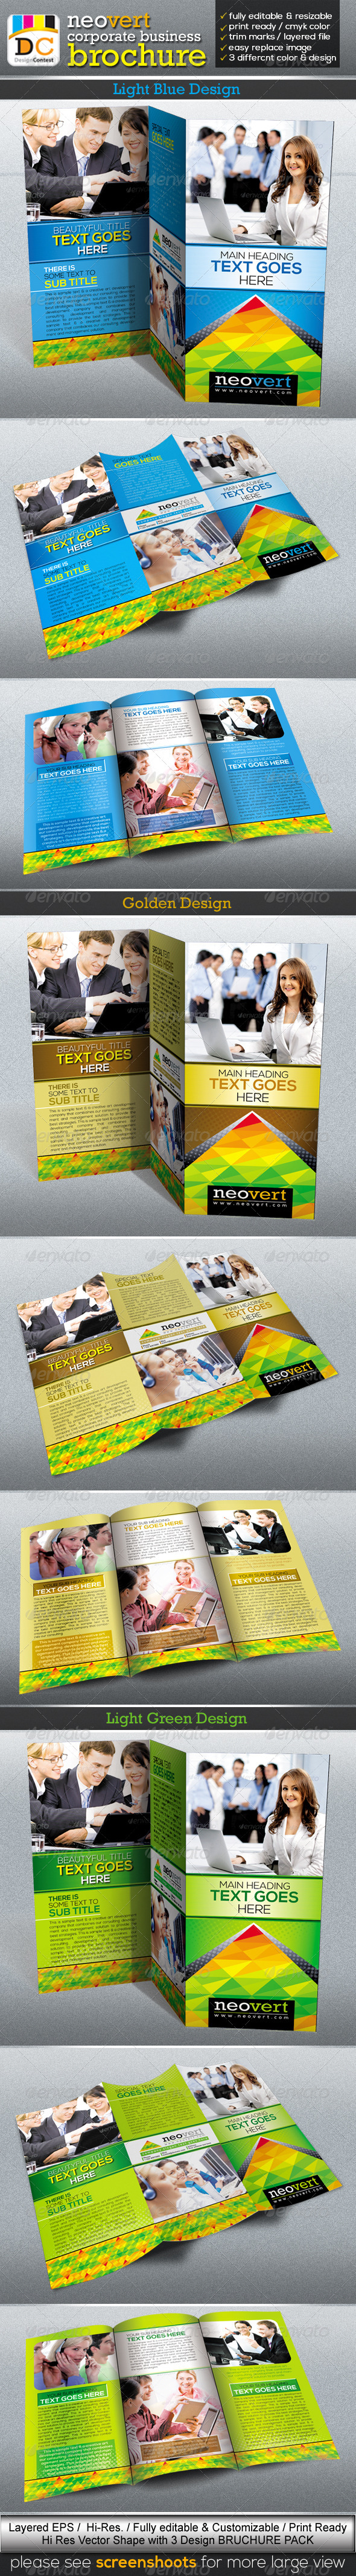 NeoVert Tri-fold Corporate Business Brochure - Corporate Brochures